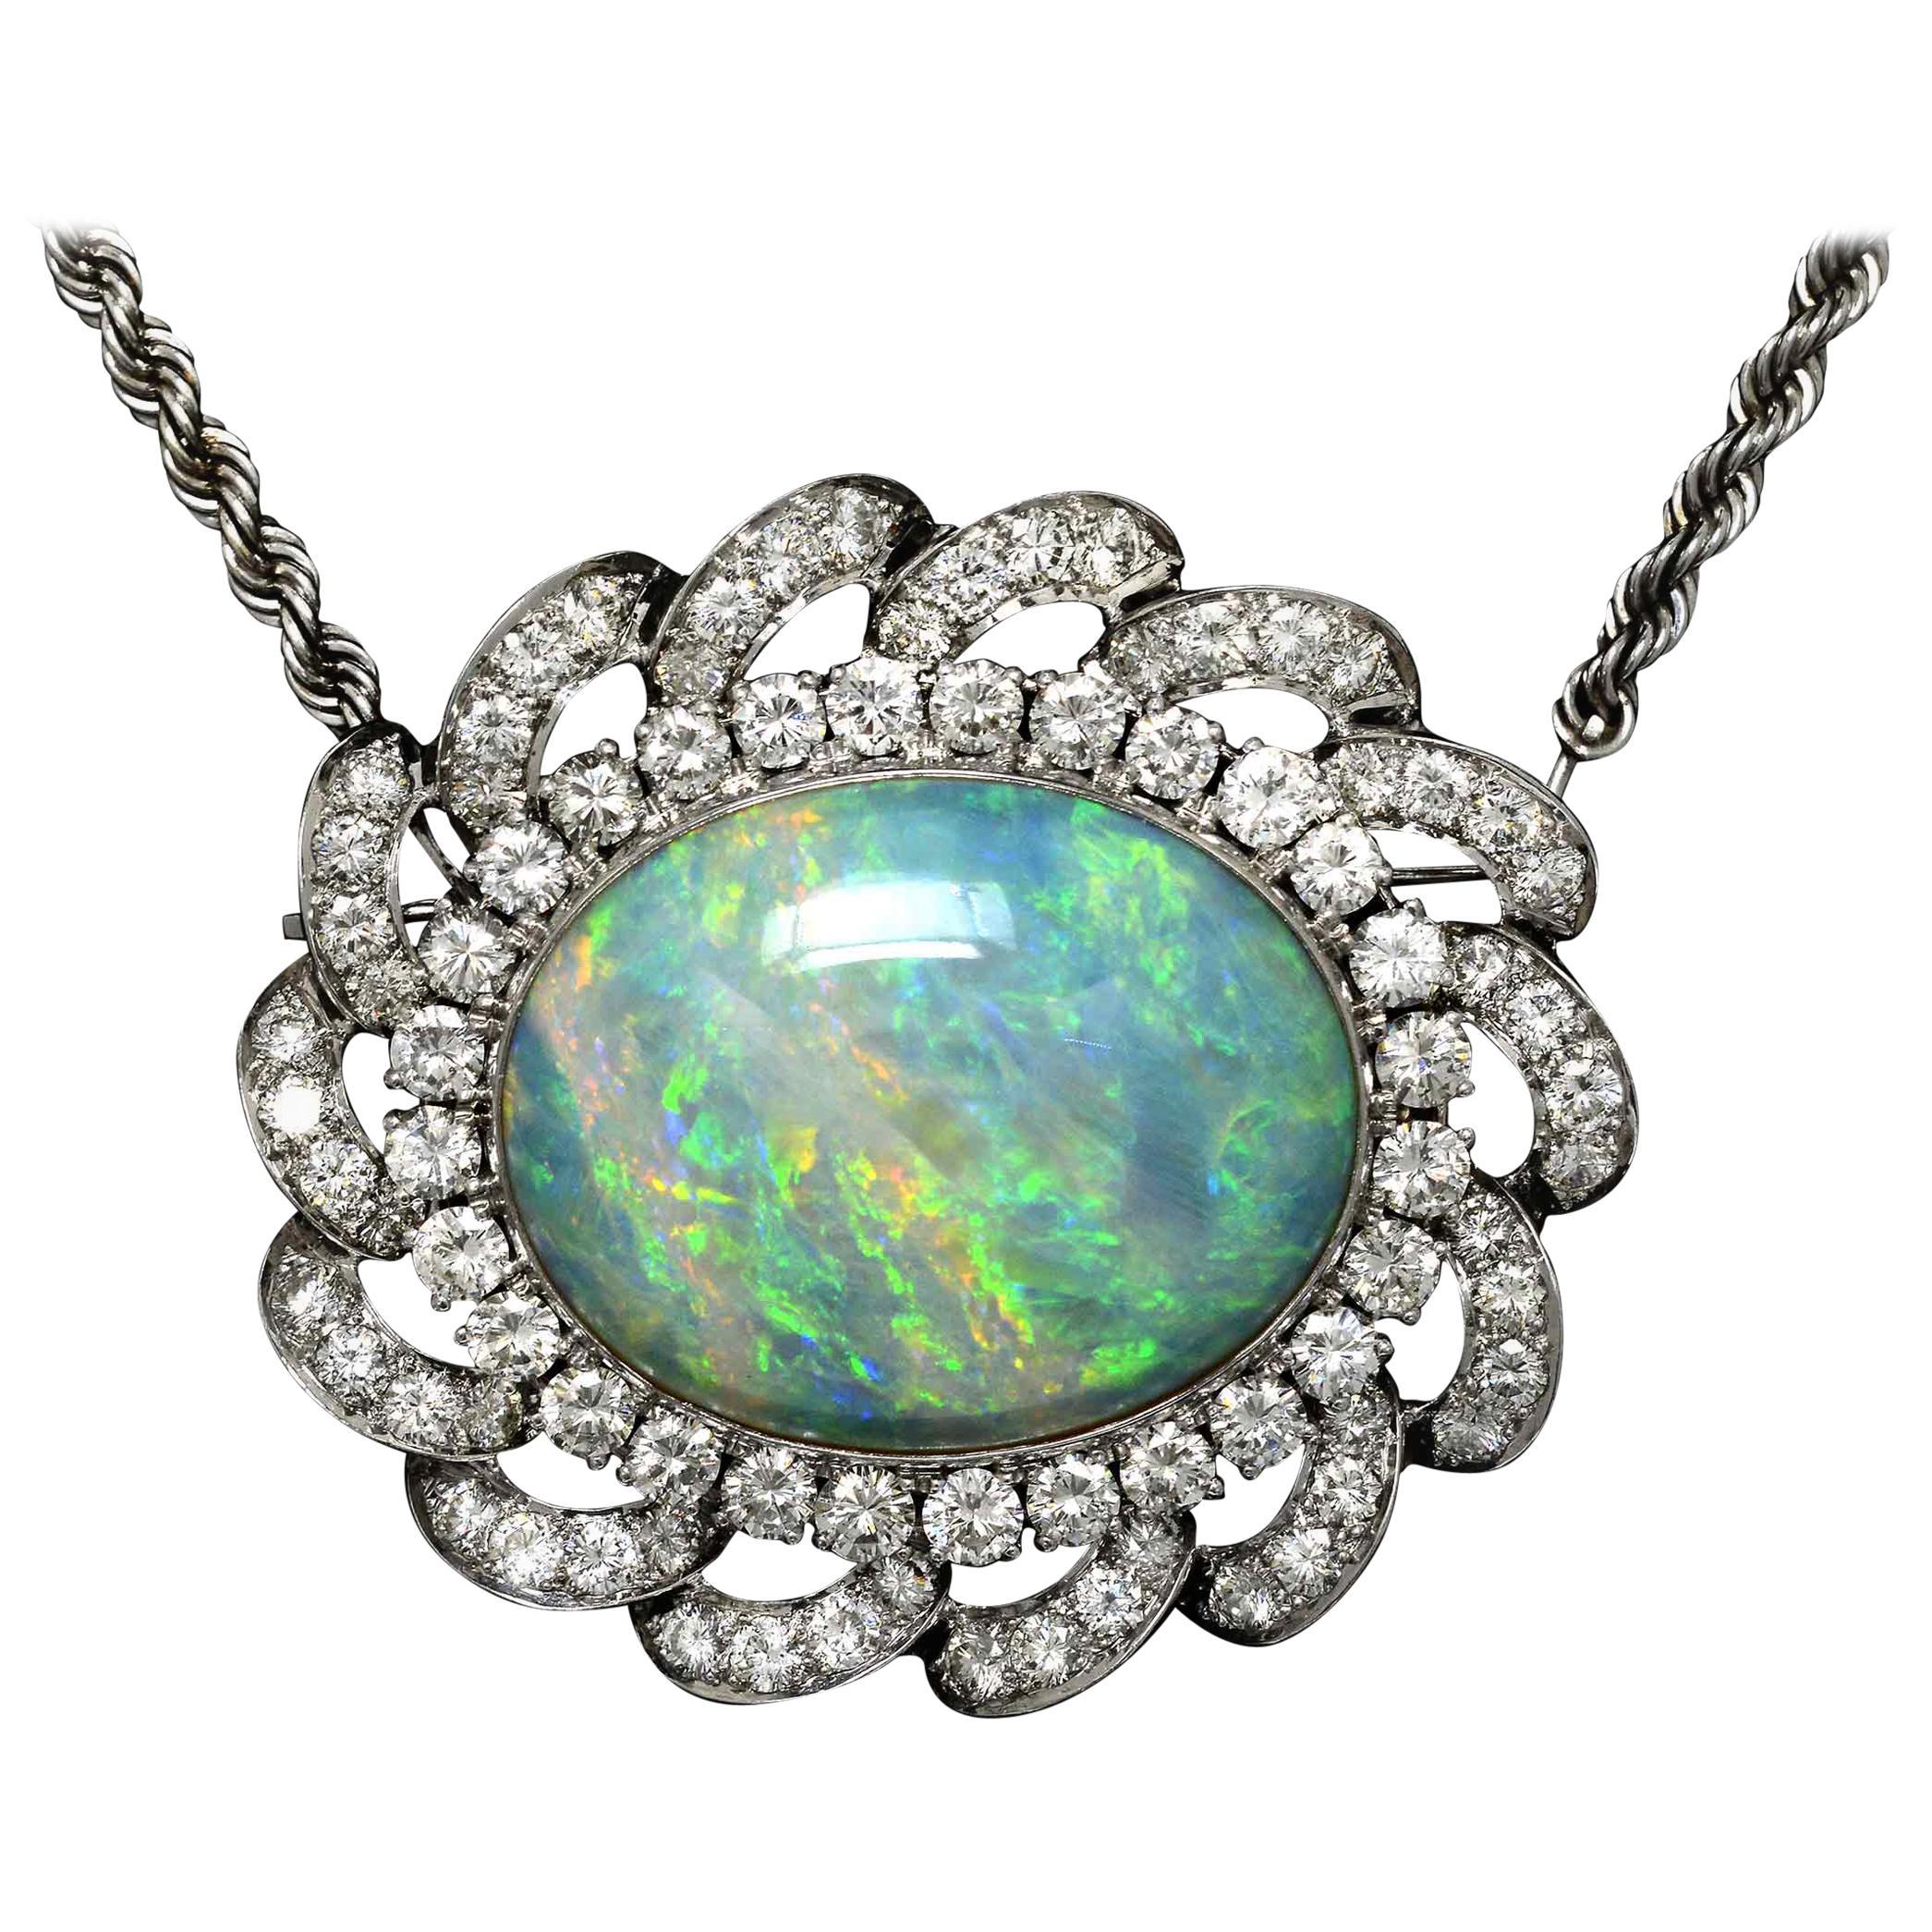 Incredible 33 Carat Opal Necklace 8 Carats Diamonds Modernist Space Age Design